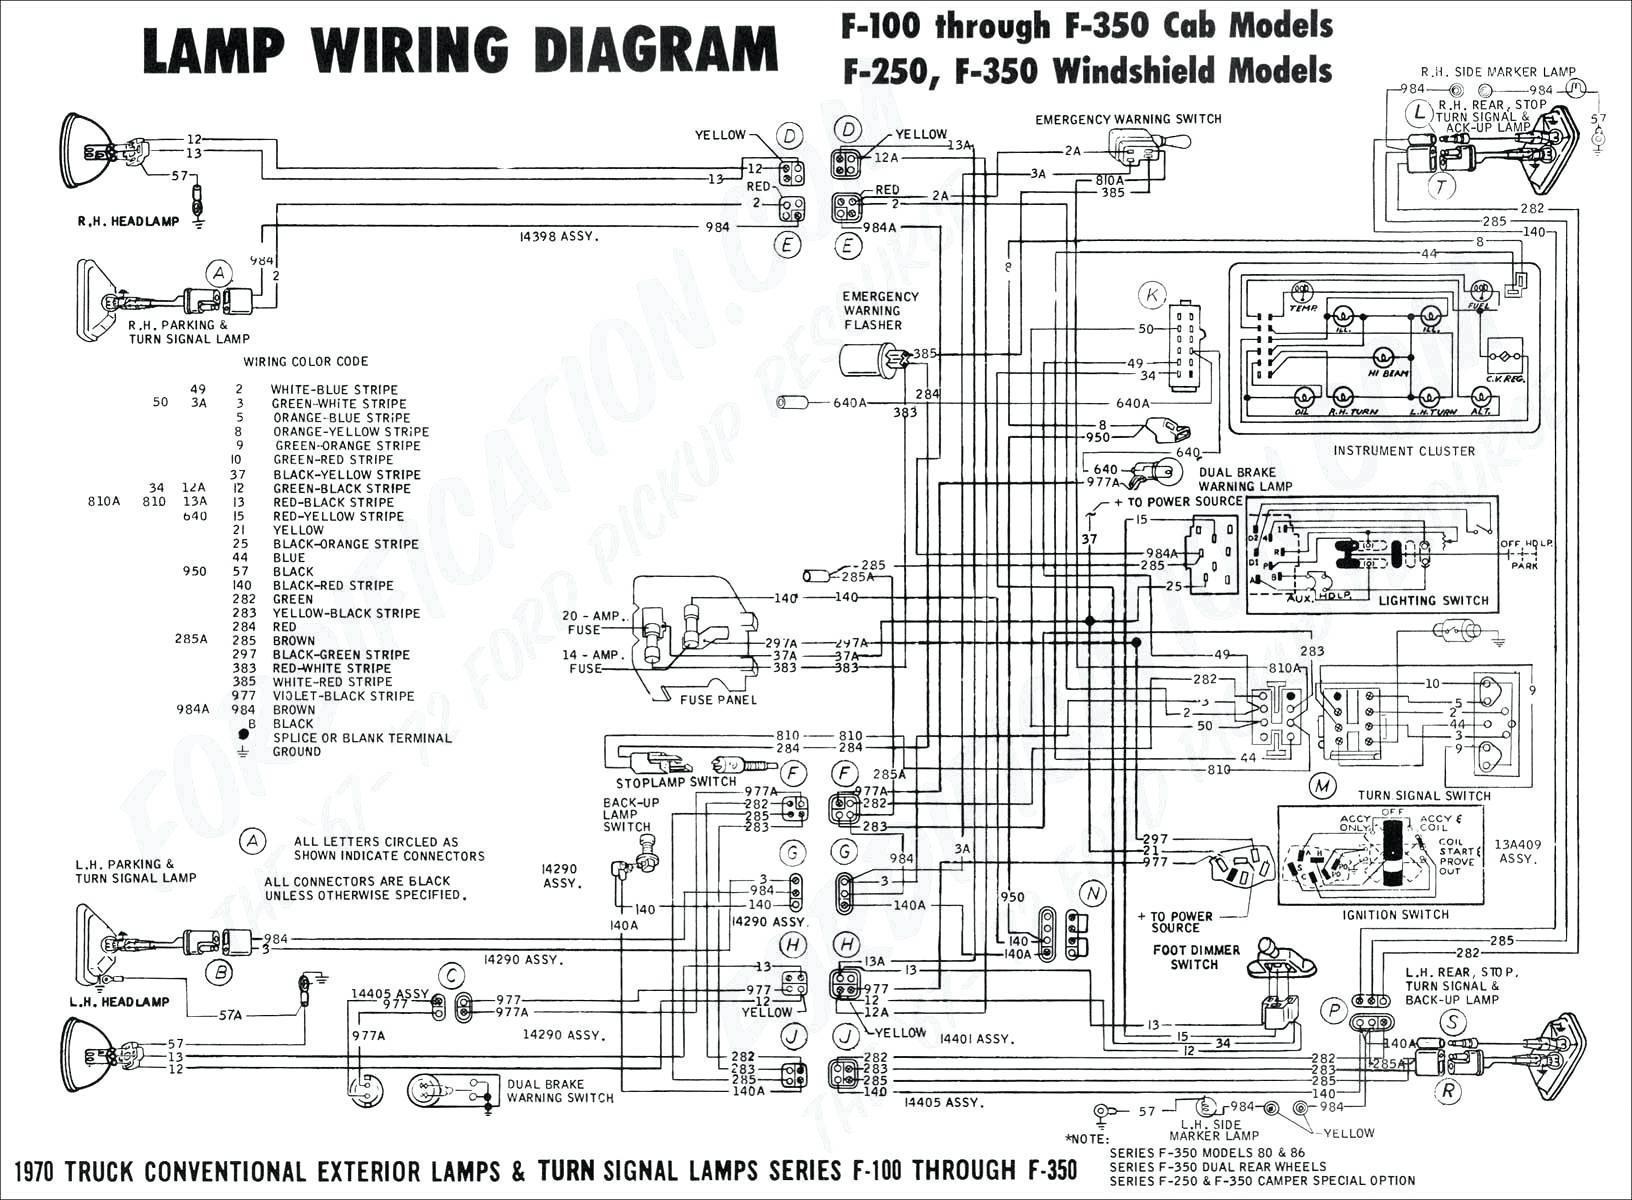 2002 mitsubishi galant engine diagram mitsubishi space wagon wiring diagram trusted wiring diagrams e280a2 of 2002 mitsubishi galant engine diagram